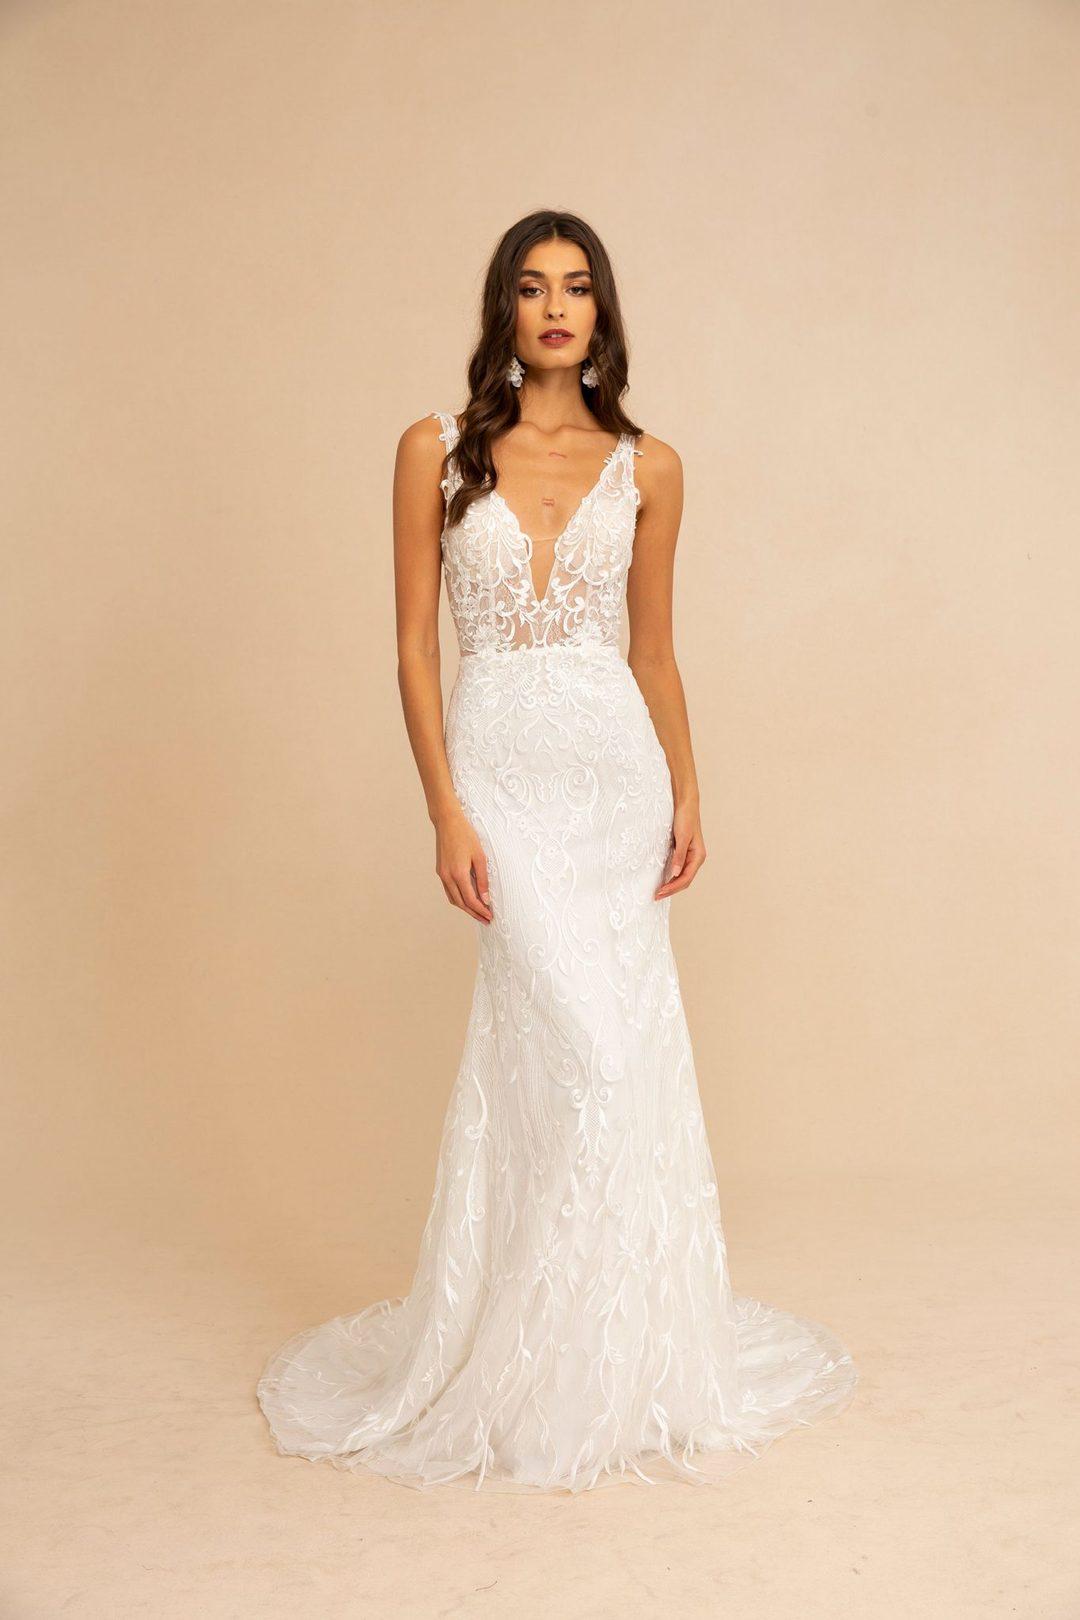 Dress main 2x 1548938621